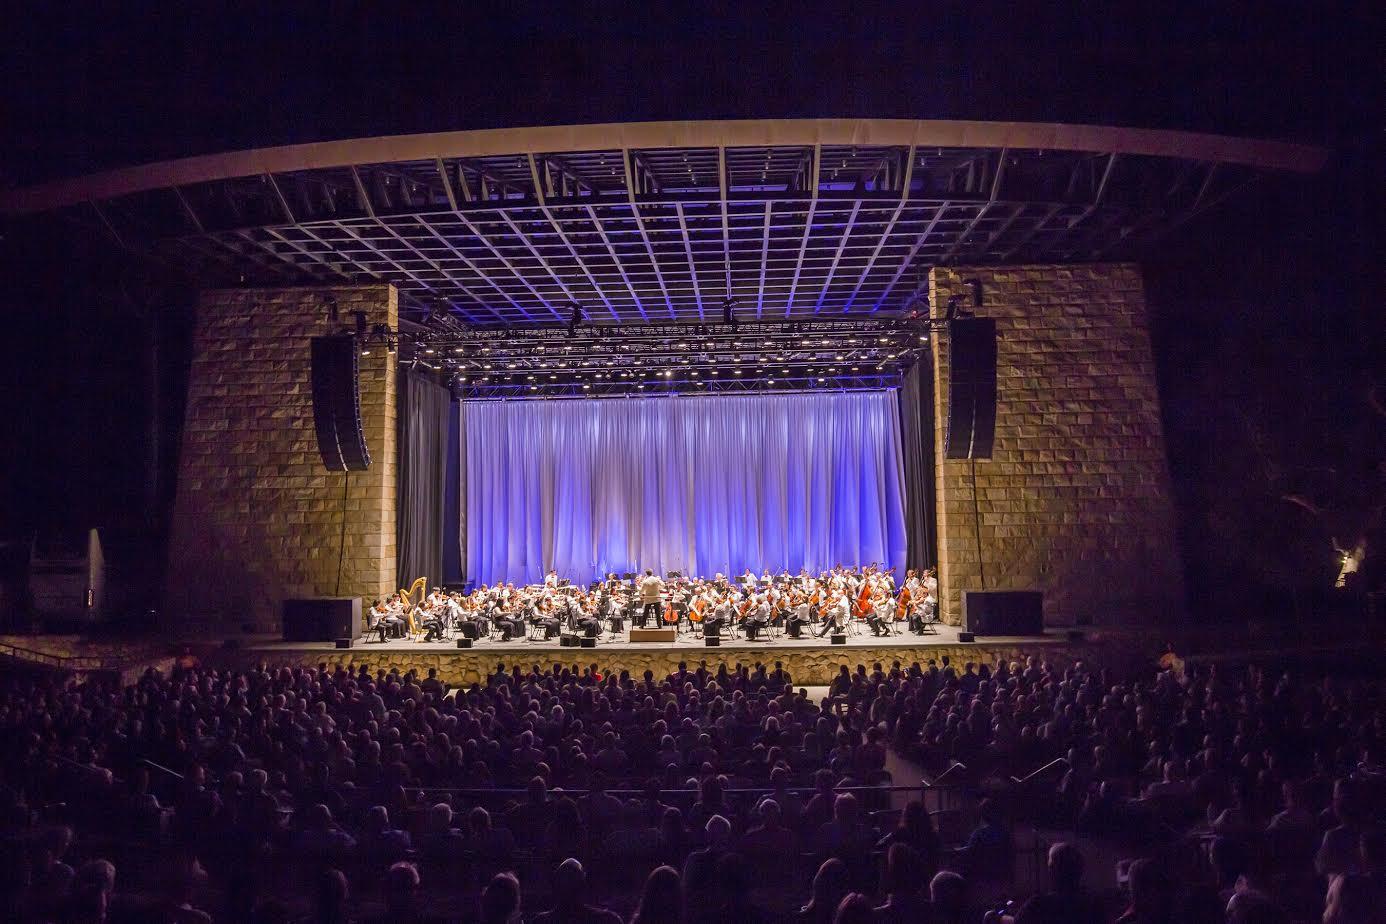 New York Philharmonic 2015 Santa Barbara Residency, 8/3/15. Photo by Chris Lee